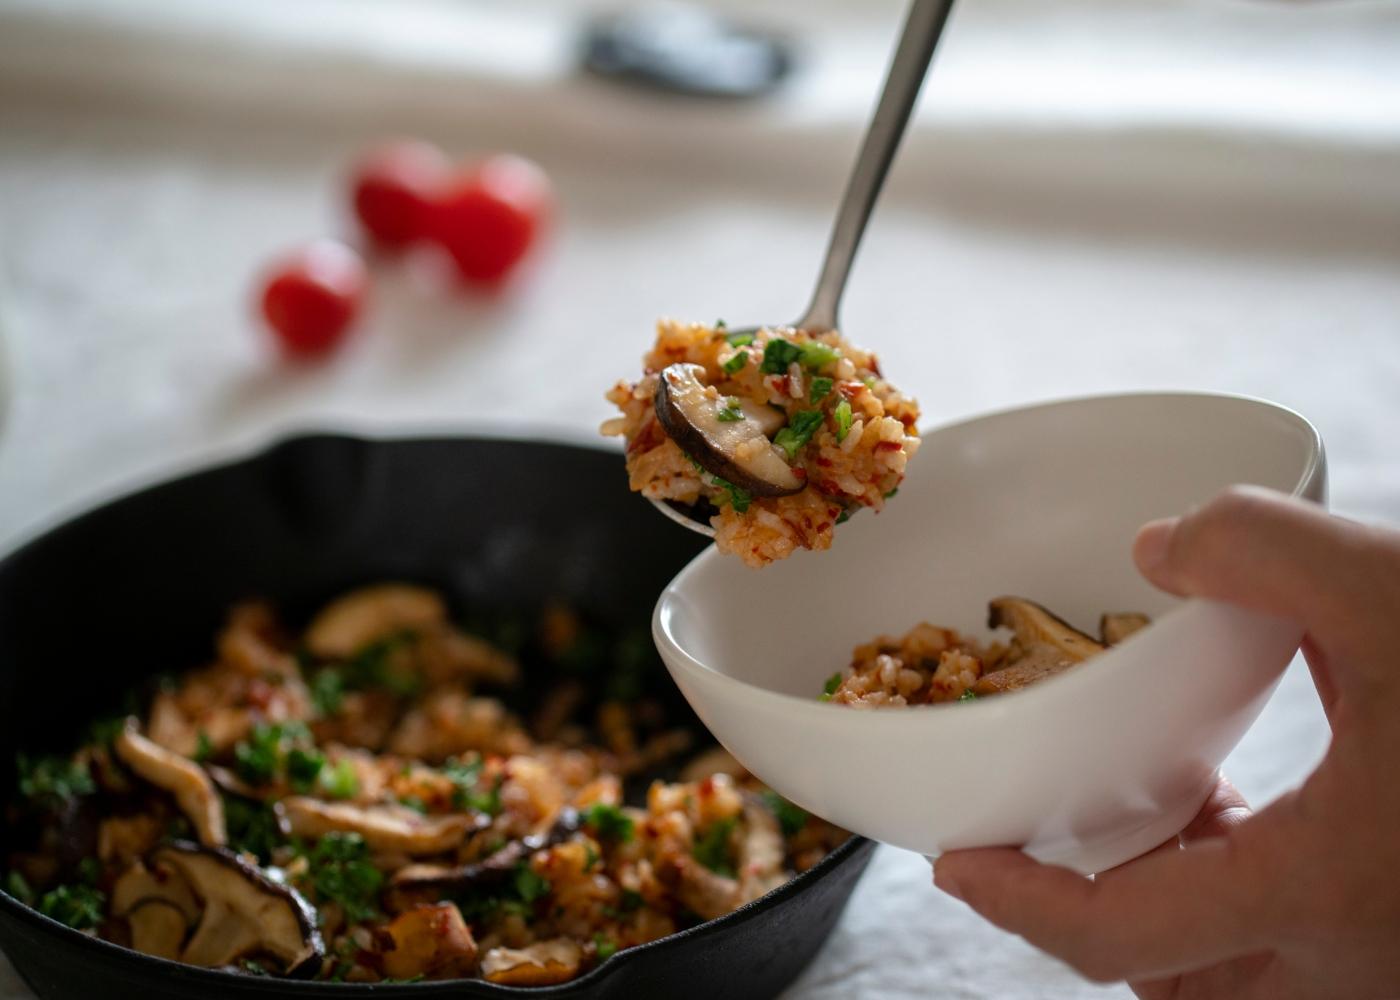 Brás de sobras de legumes e cogumelos